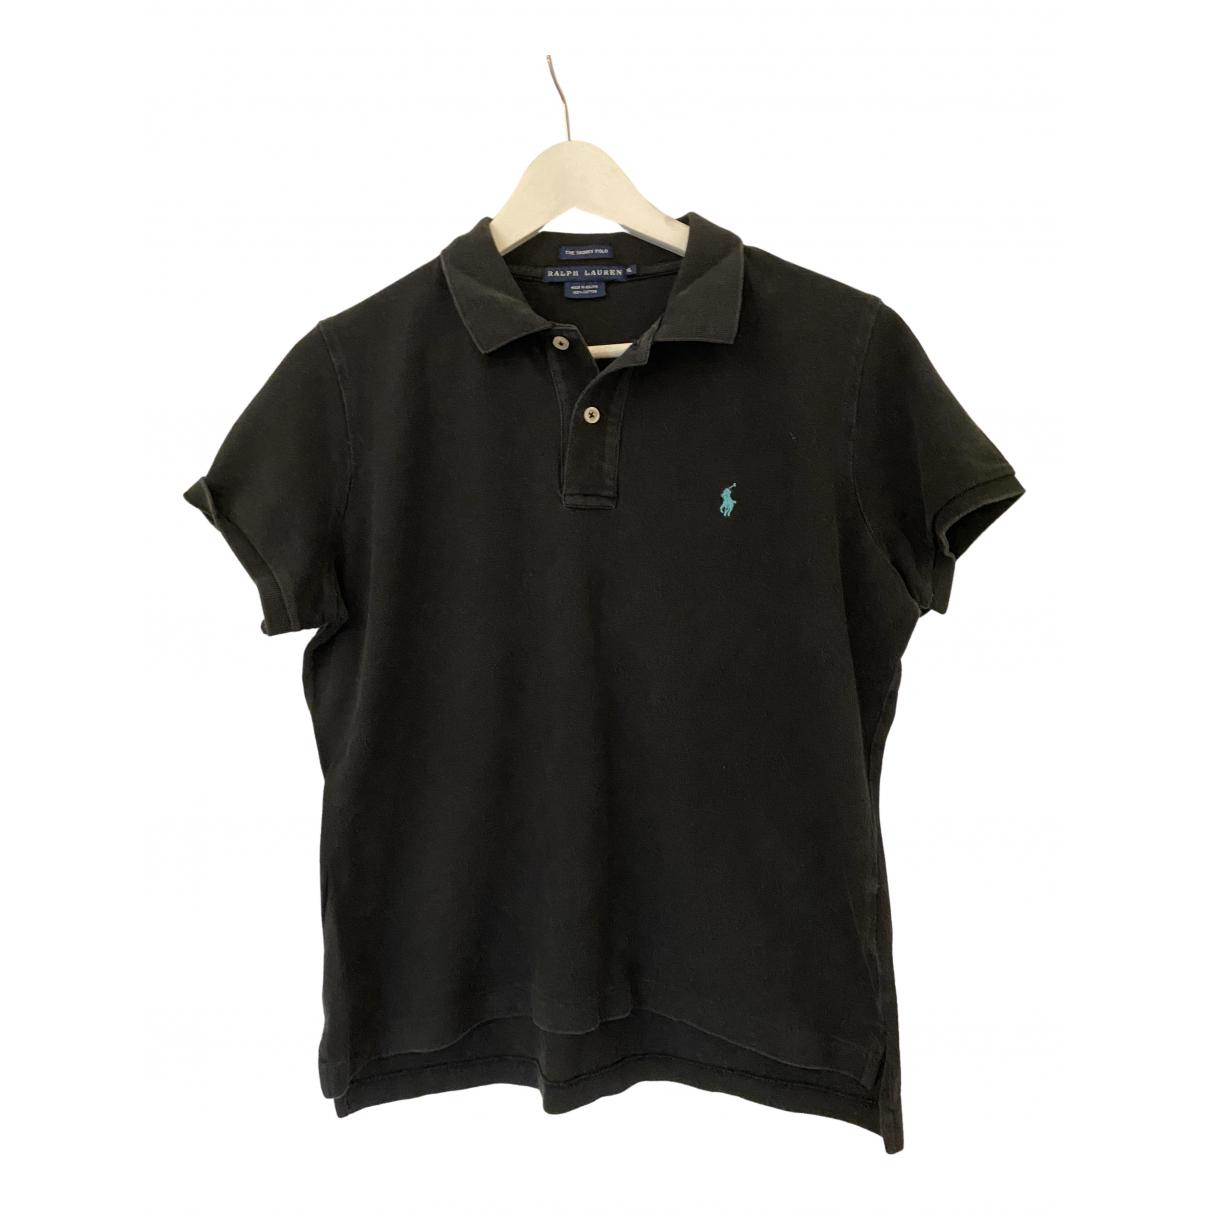 Polo Ralph Lauren Polo cintré manches courtes Black Cotton  top for Women XL International